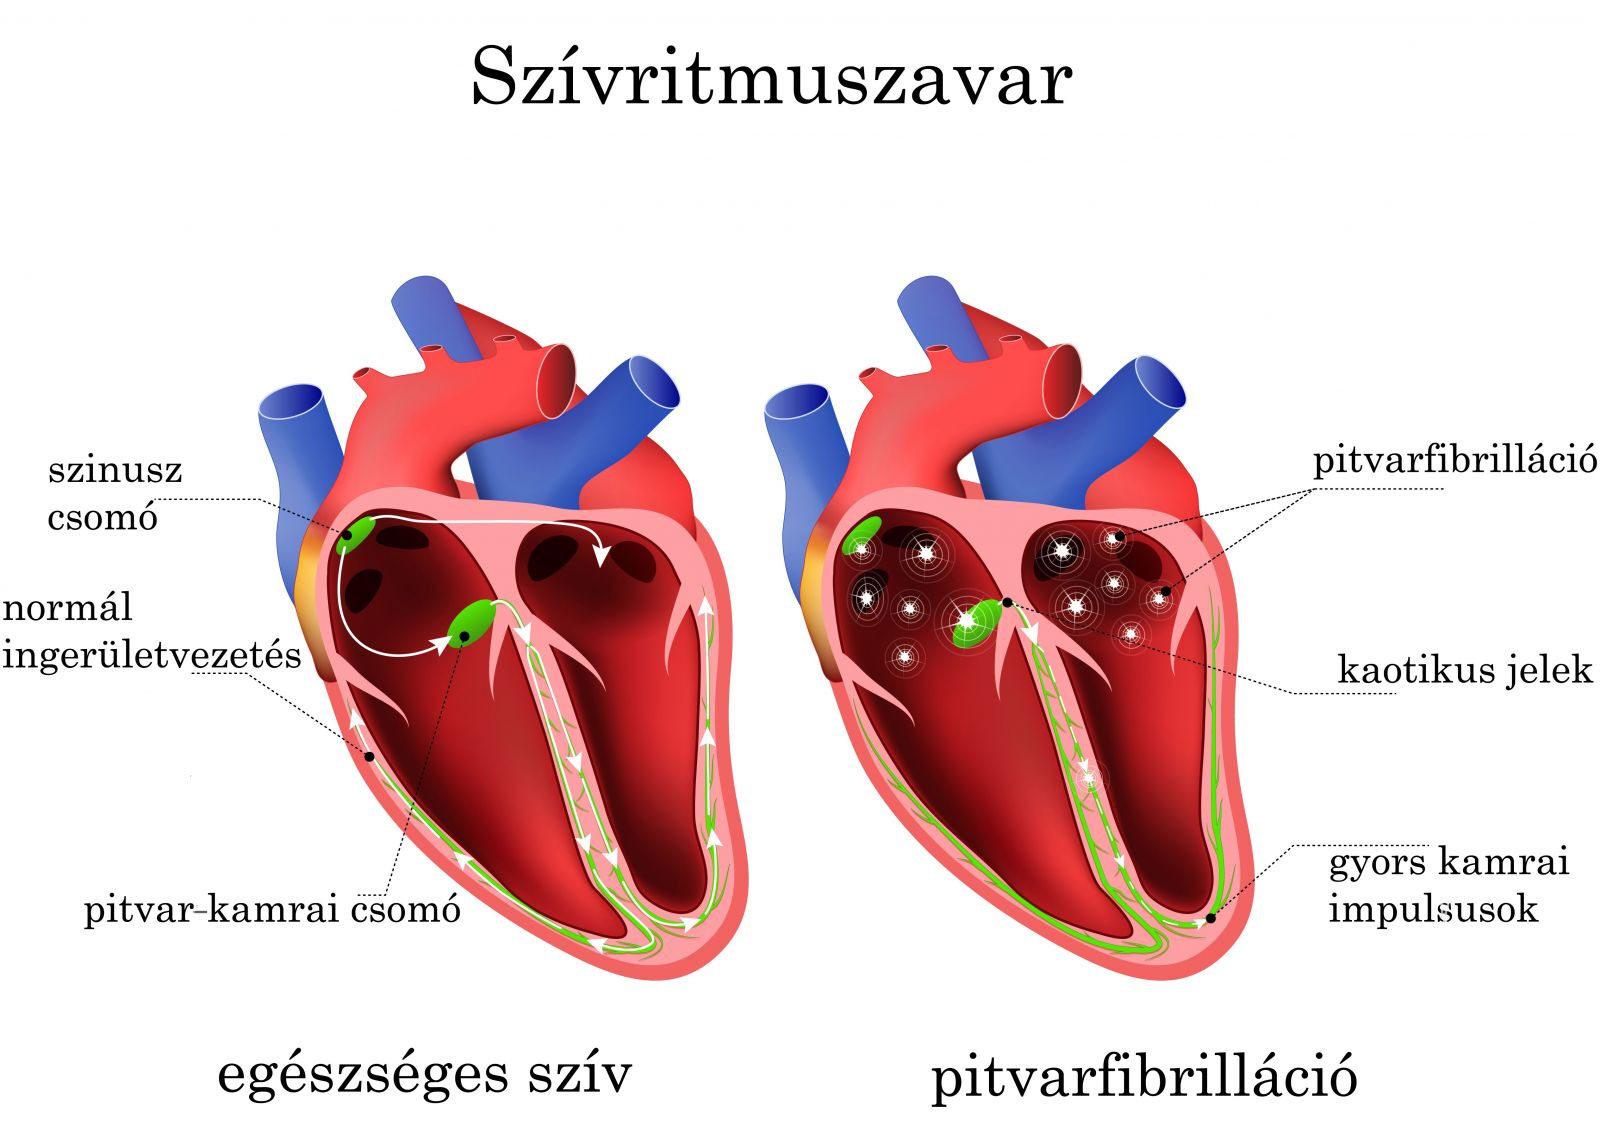 dibikor magas vérnyomás esetén milyen gyümölcsleveket kell inni magas vérnyomás esetén